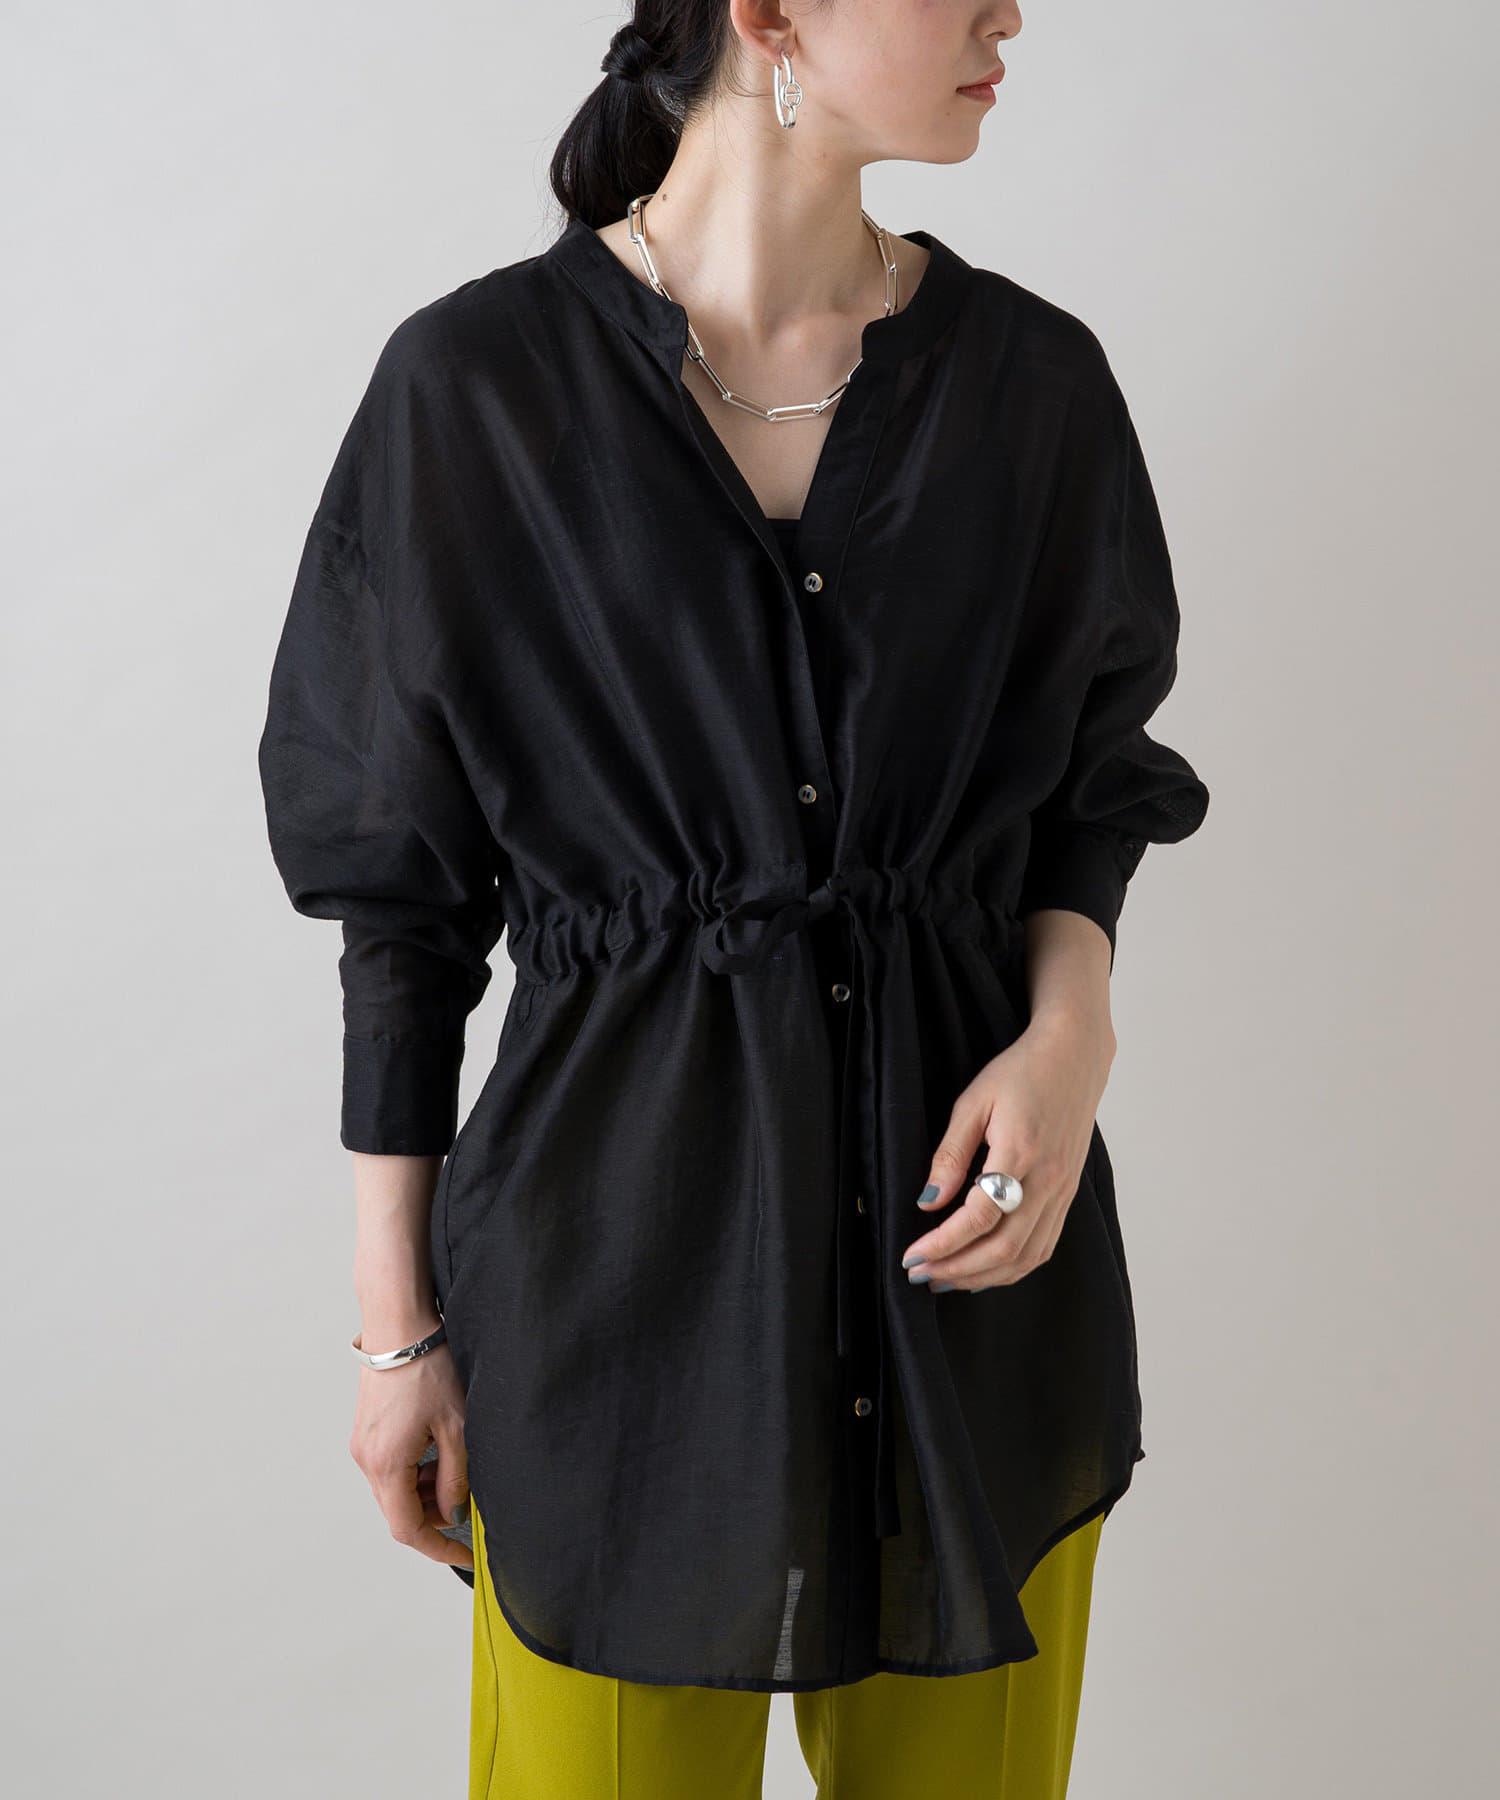 Loungedress(ラウンジドレス) スキッパードロストシャツ